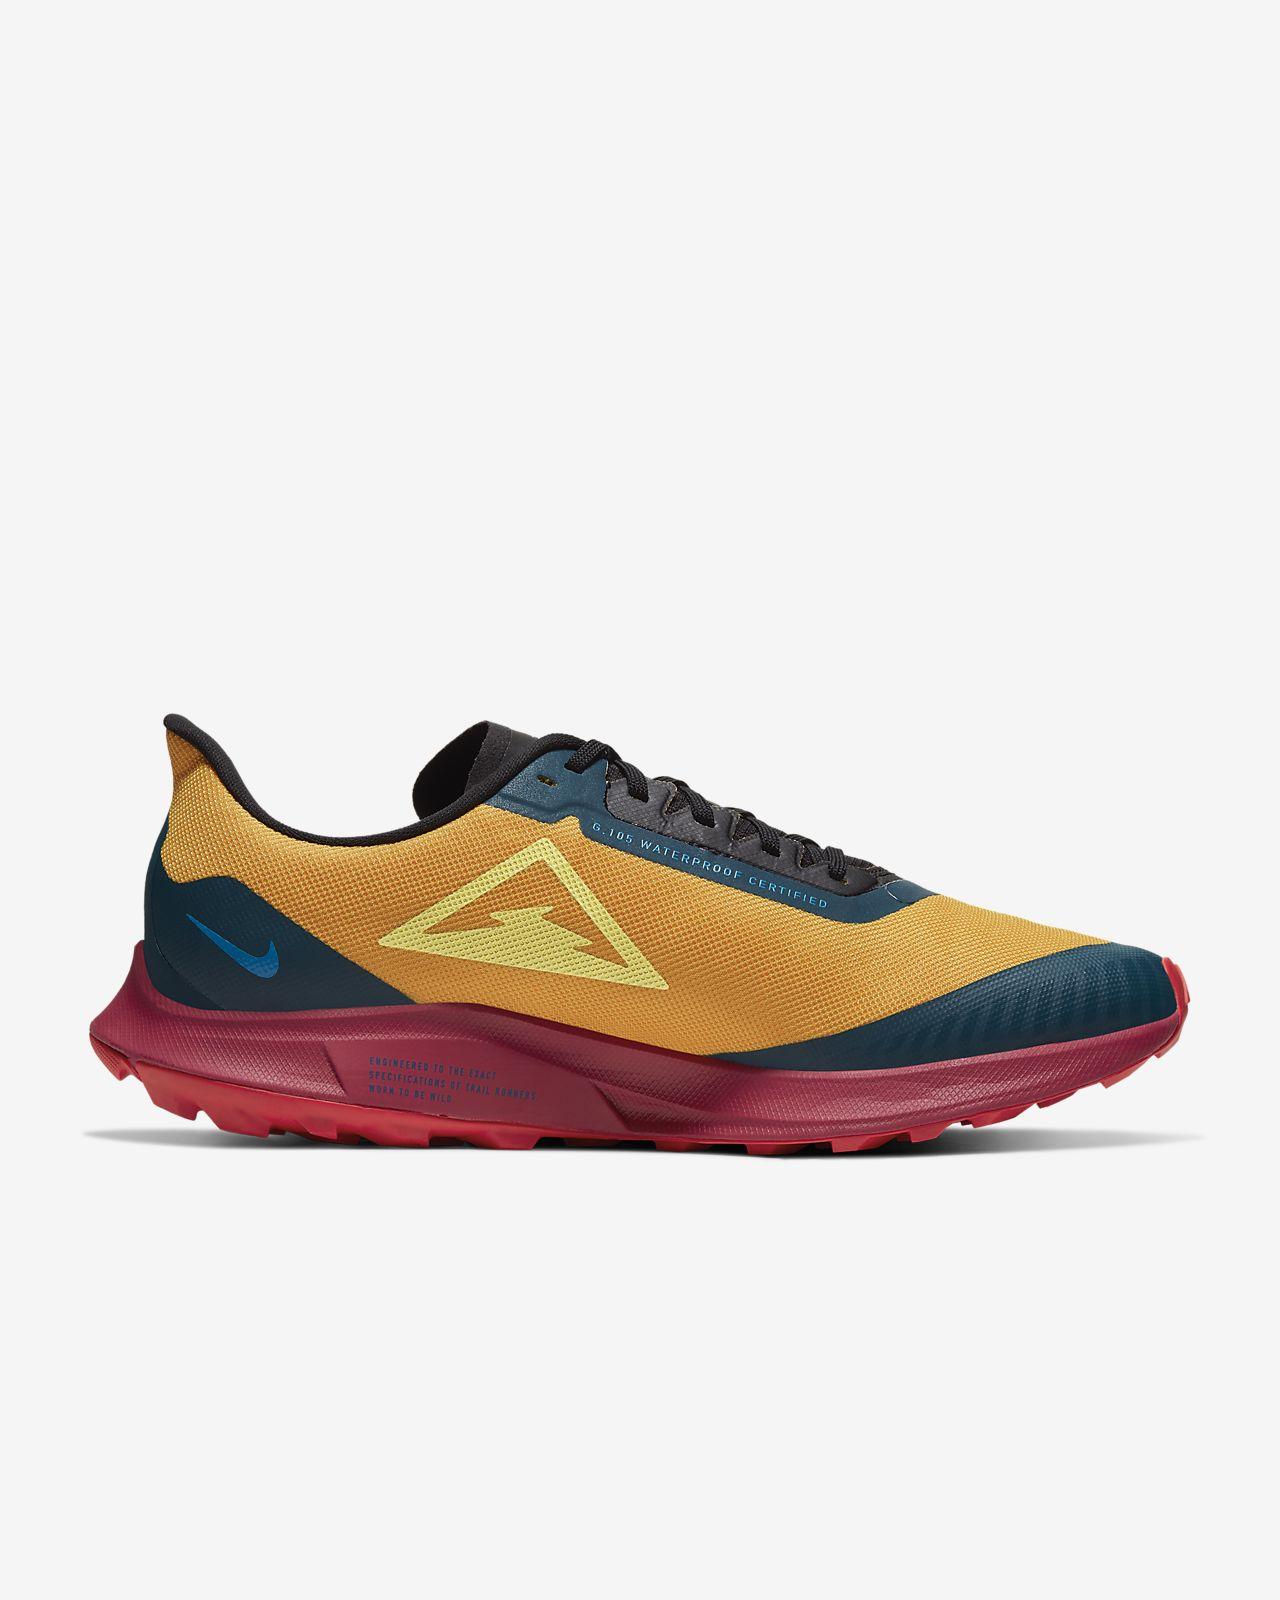 NIKE ZOOM PEGASUS TURBO SHIELD 30 BLACK Gold Running Shoes